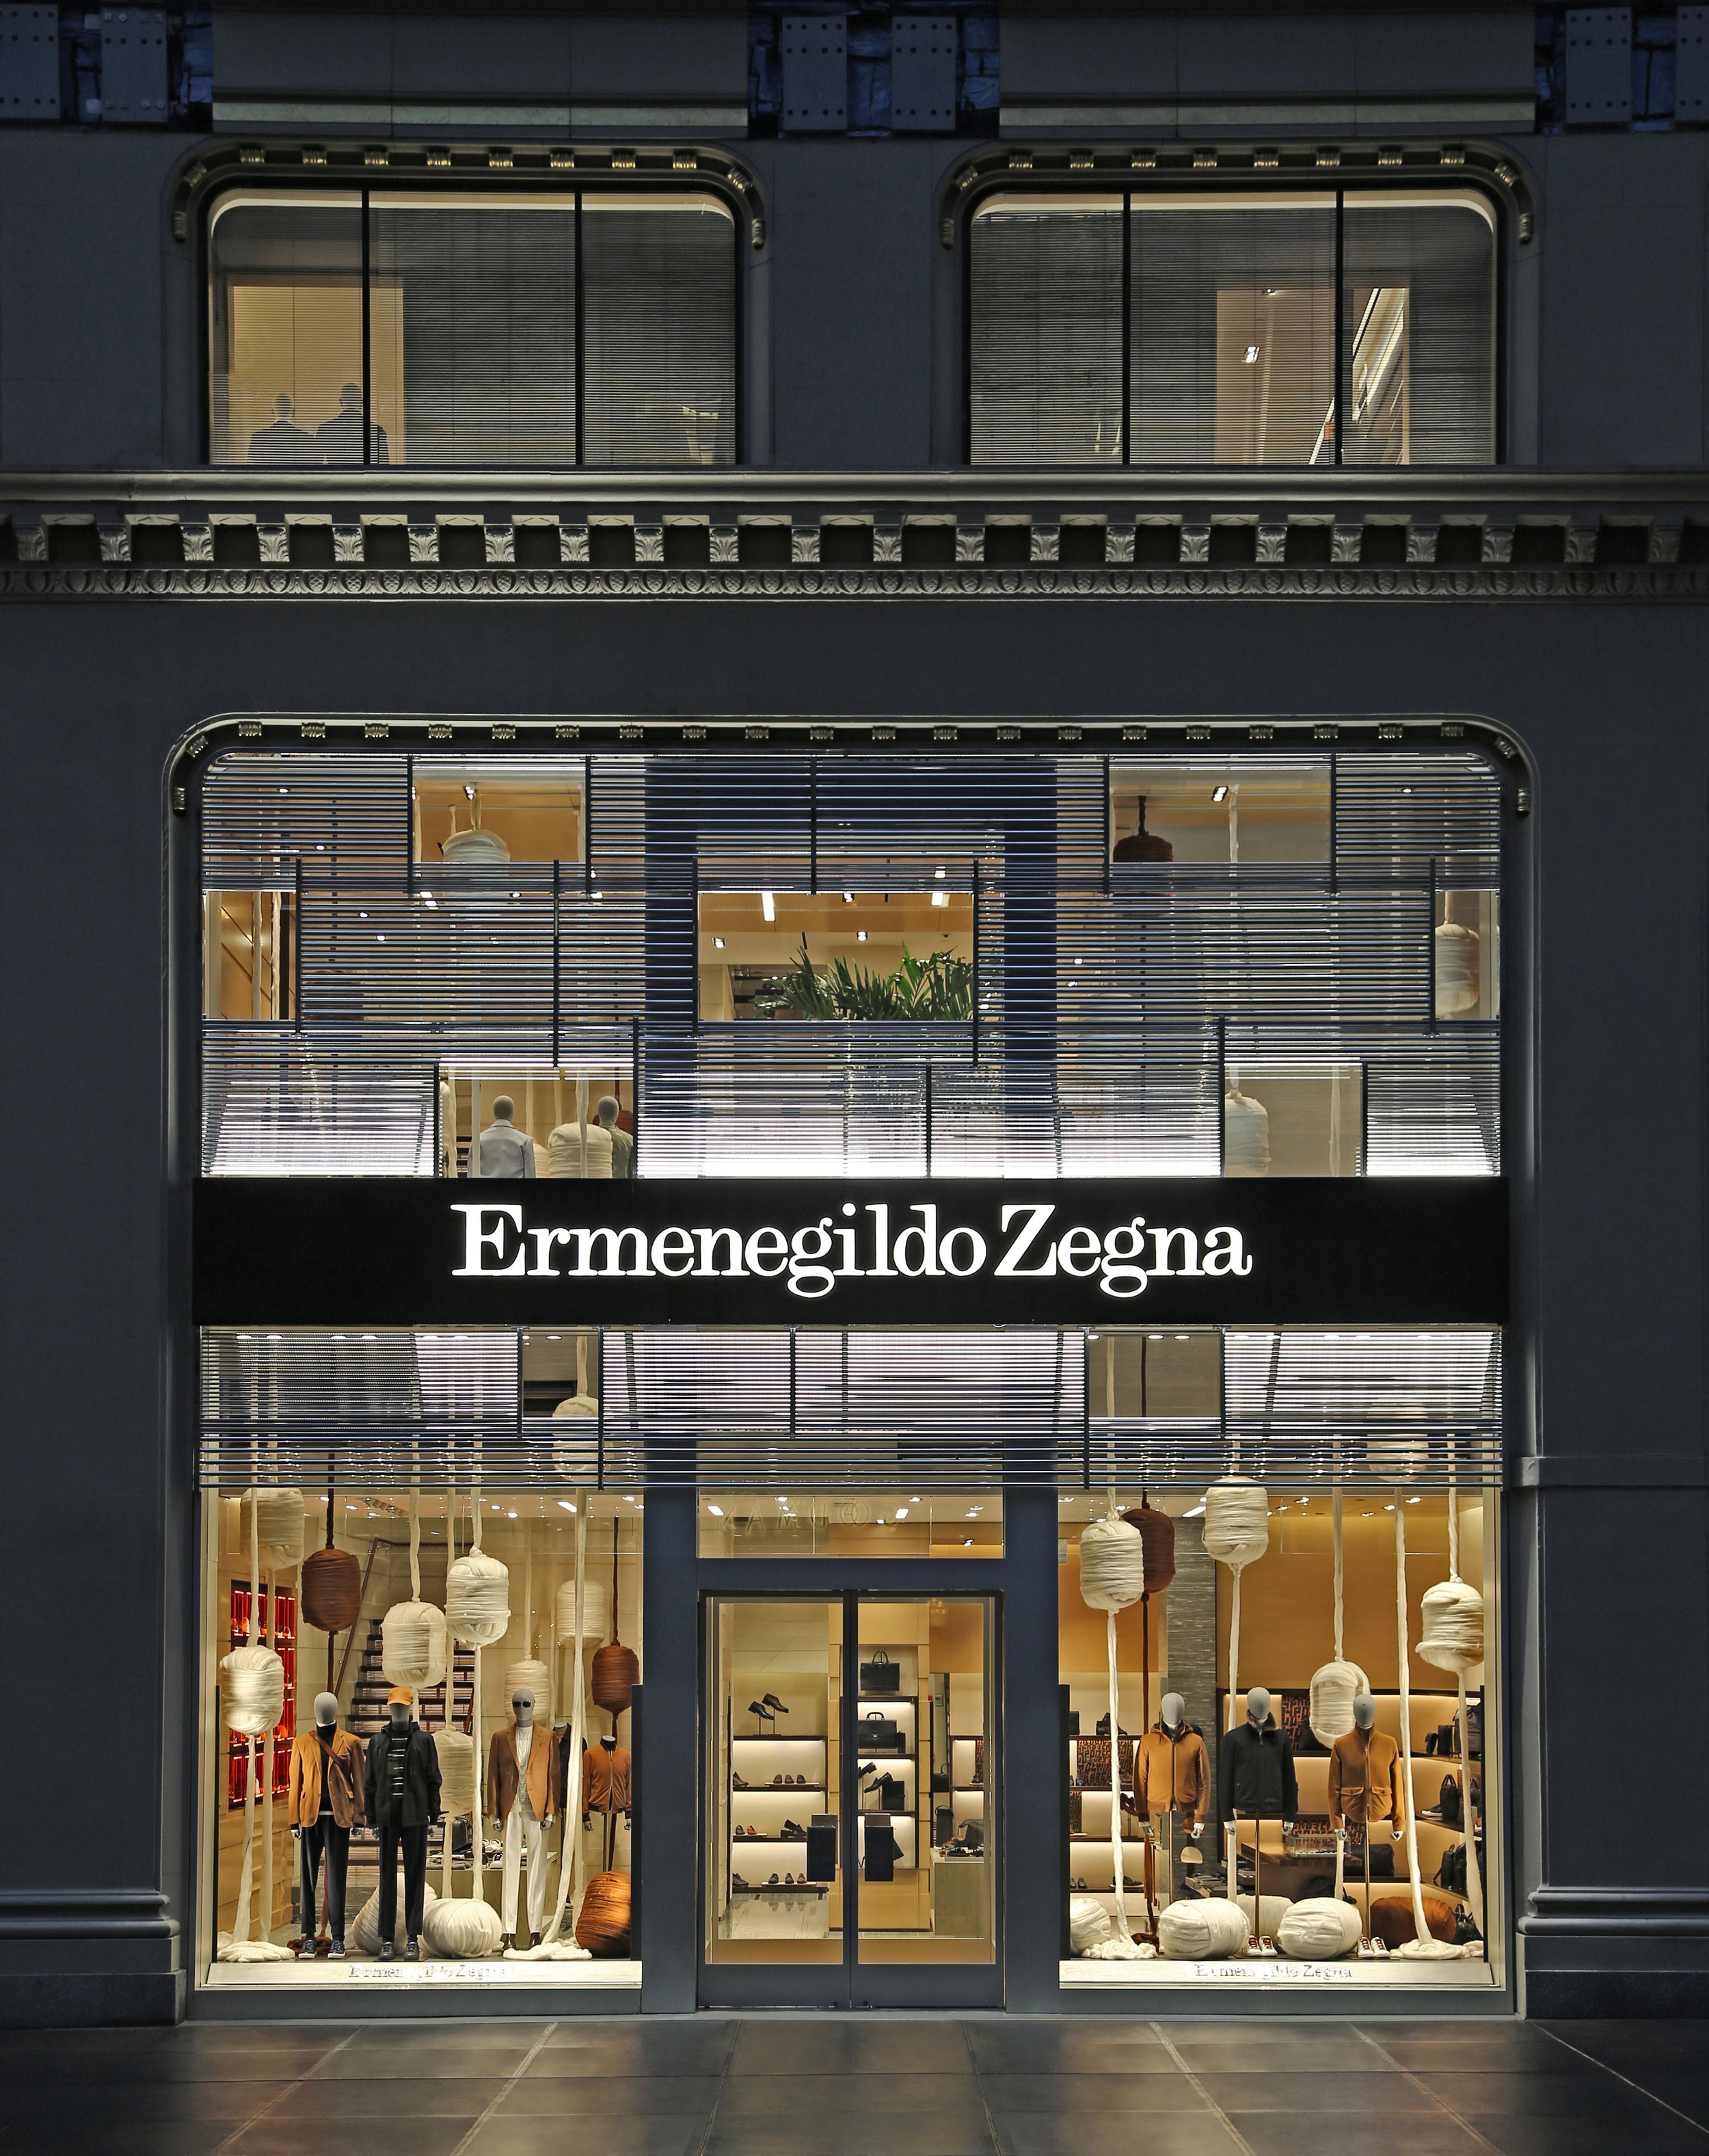 Ermenegildo Zegna - Ermenegildo Zegna unveil its latest Global Store in New York City, located at 4 West 57th Street, in the historic Crown Building.